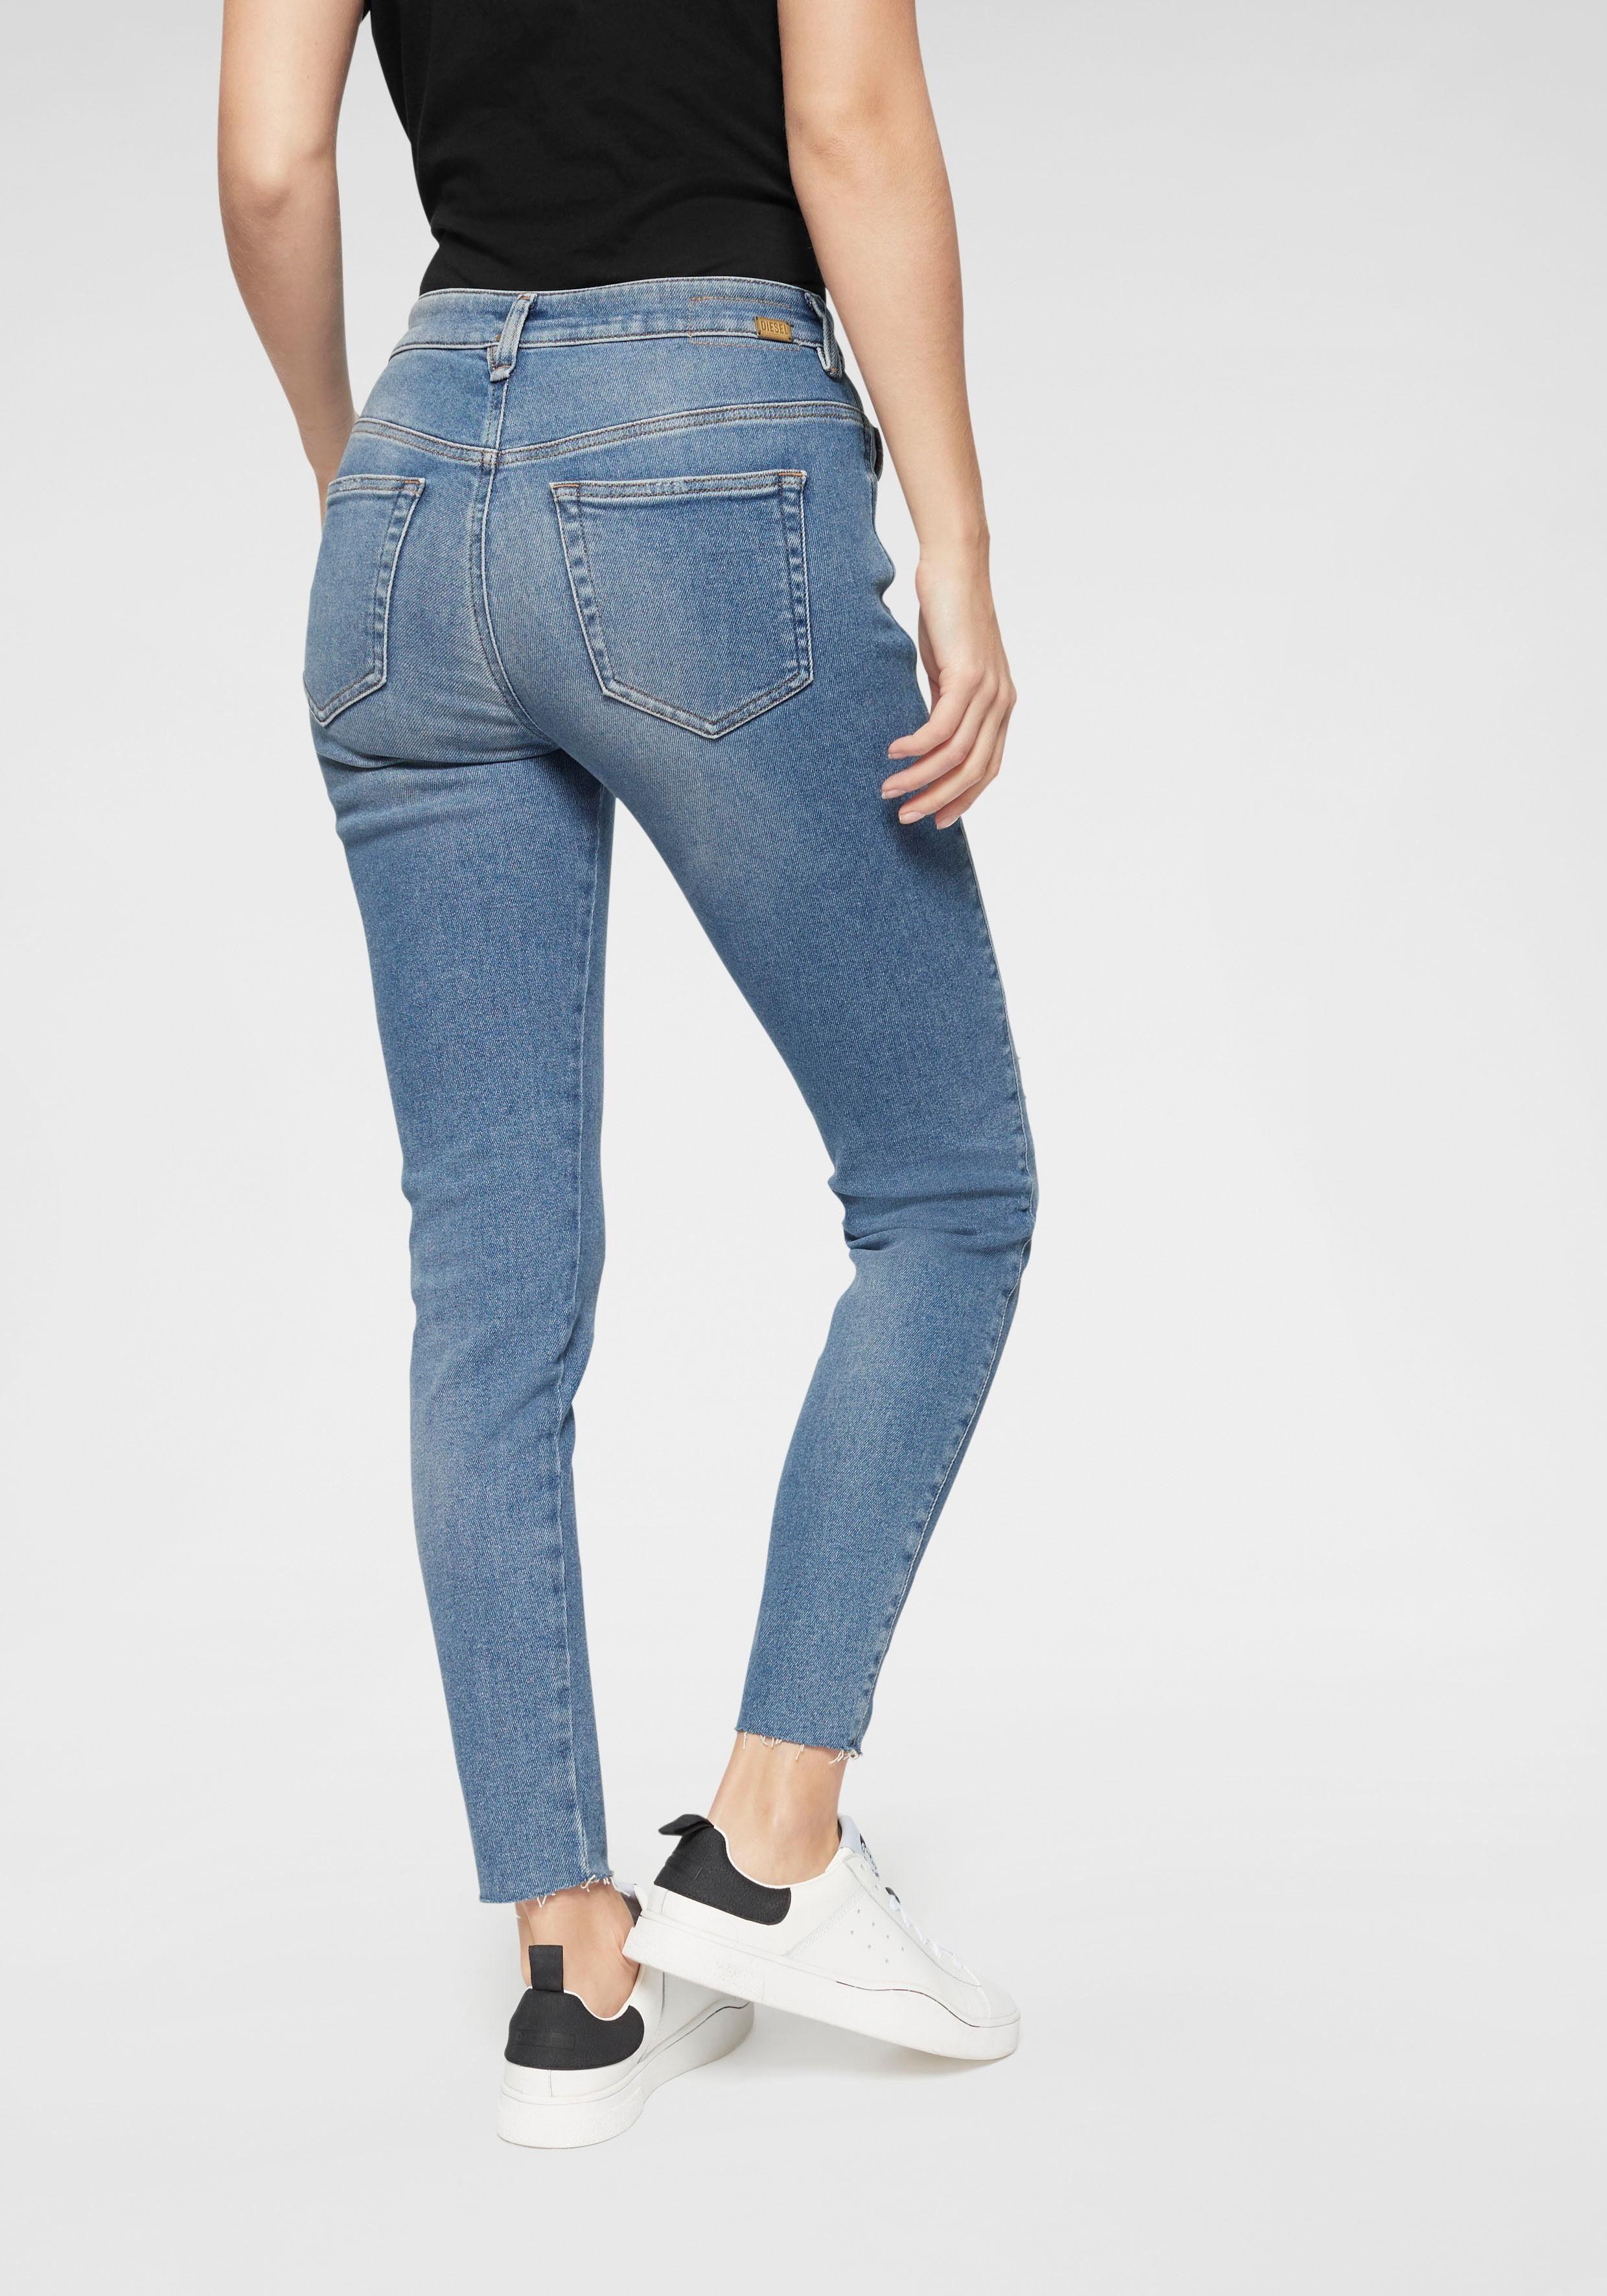 Damen Jeans Baggy Boyfriend Hose Chino Stretch Pailetten Stonewashed hueftjeans